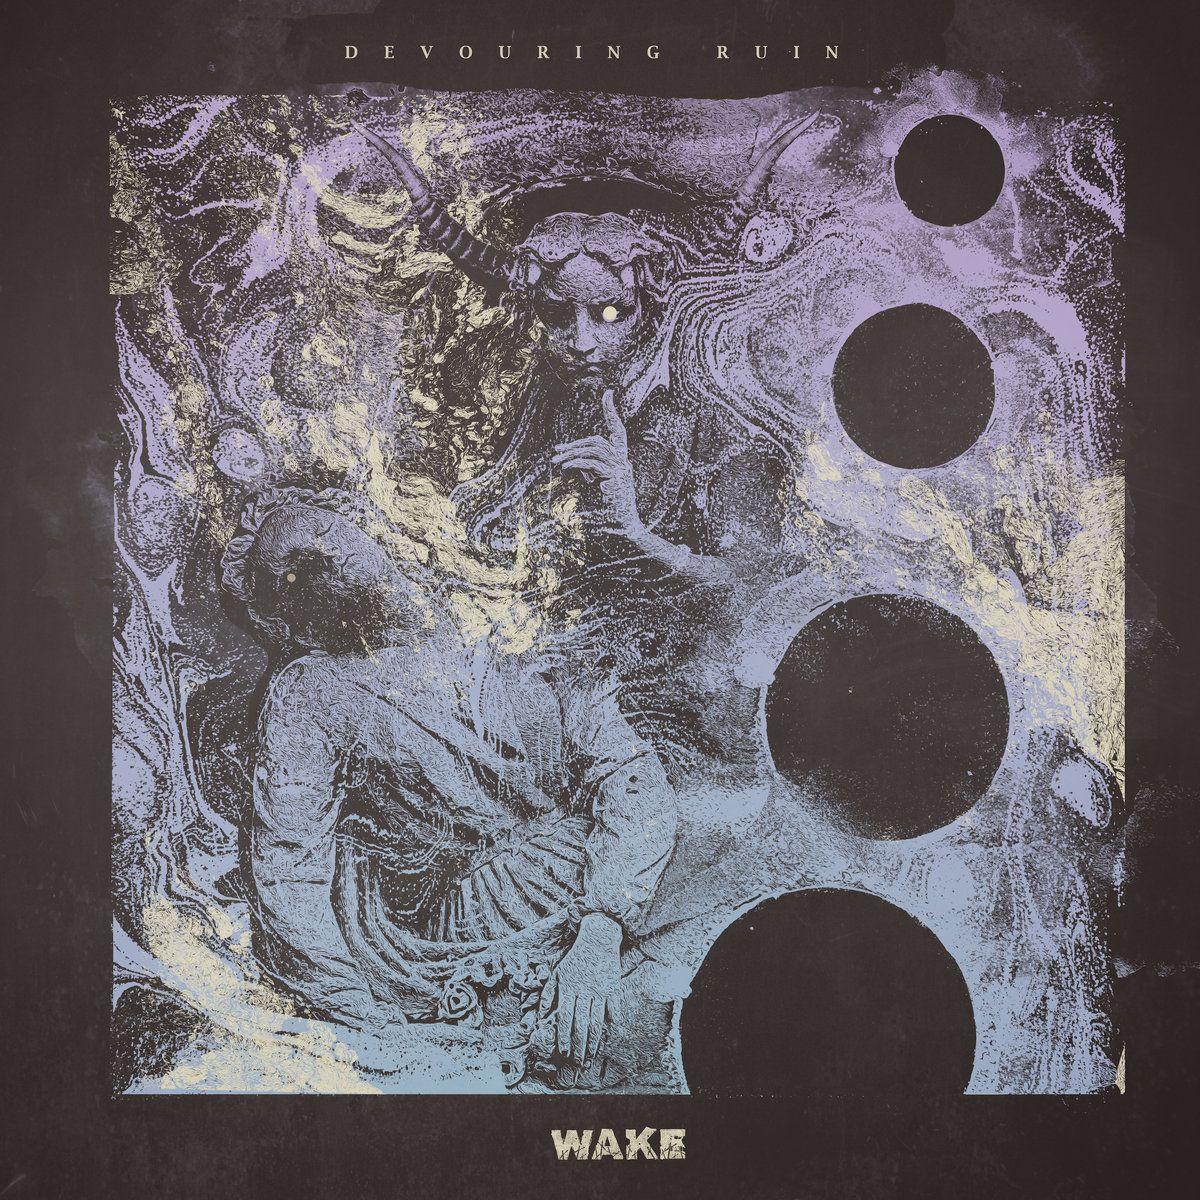 Wake (CAN) - Devouring Ruin